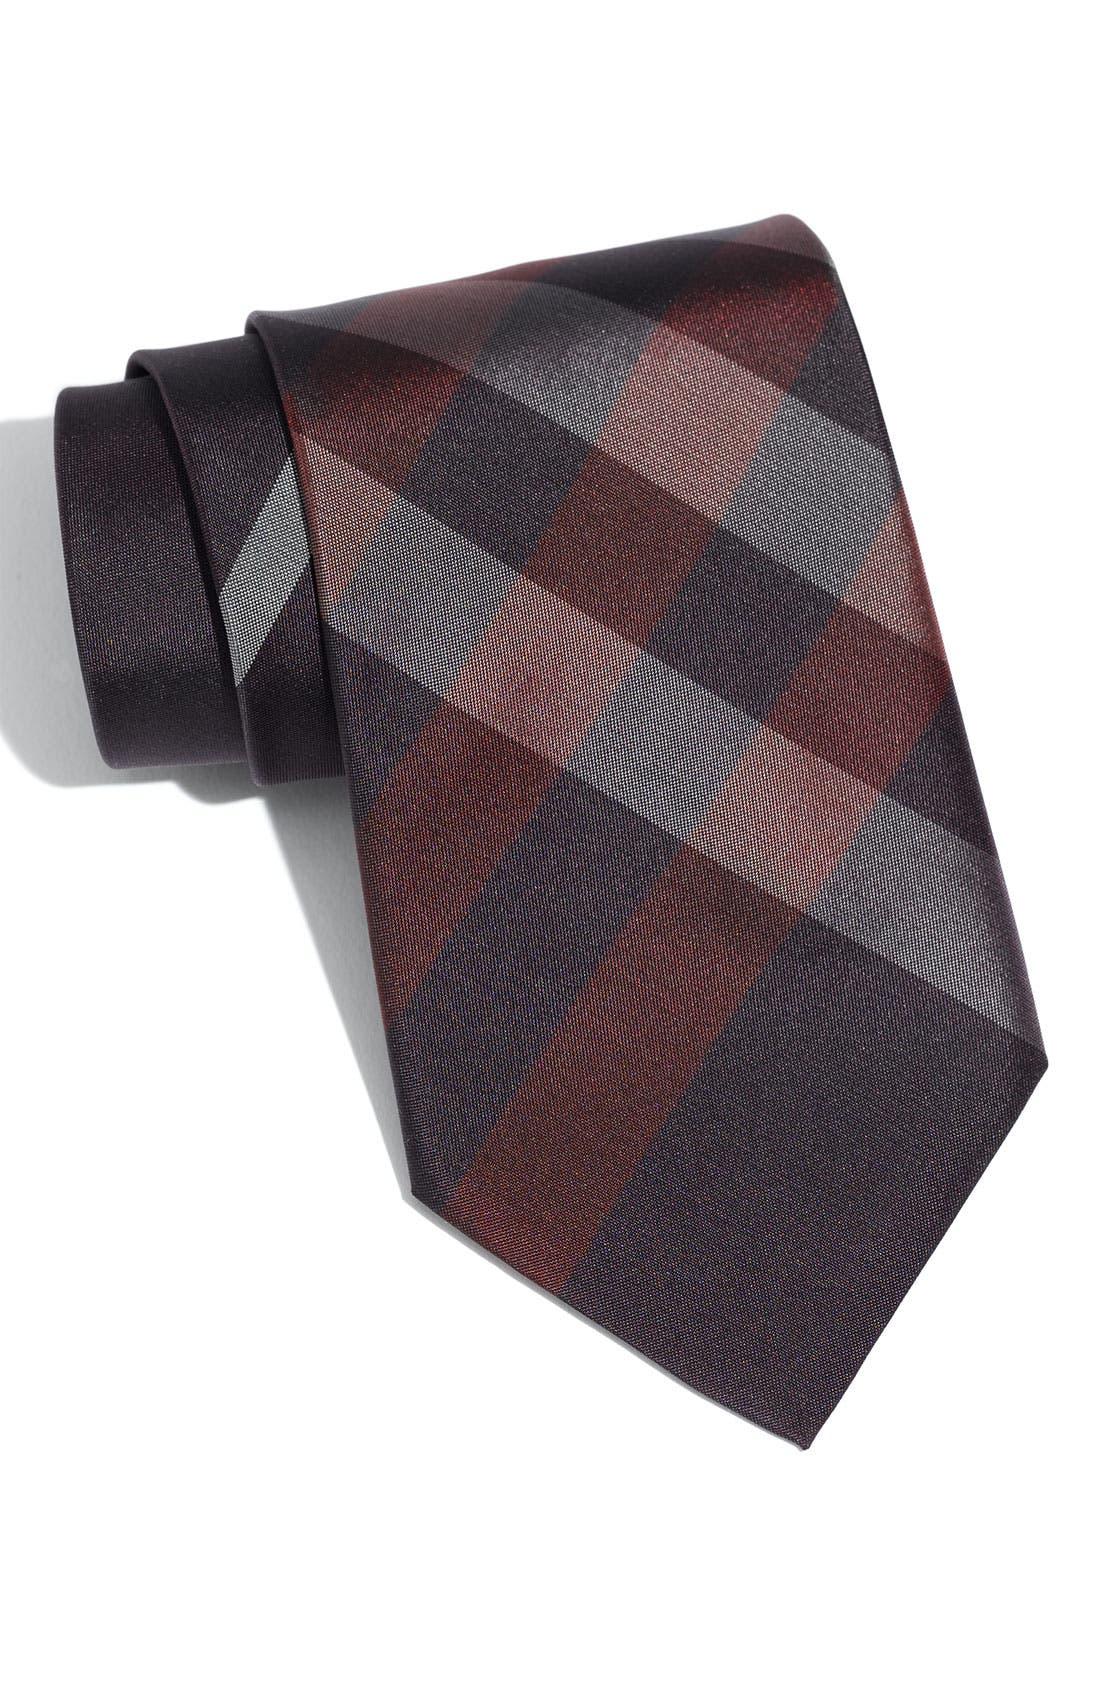 Alternate Image 1 Selected - Burberry London Woven Silk Tie